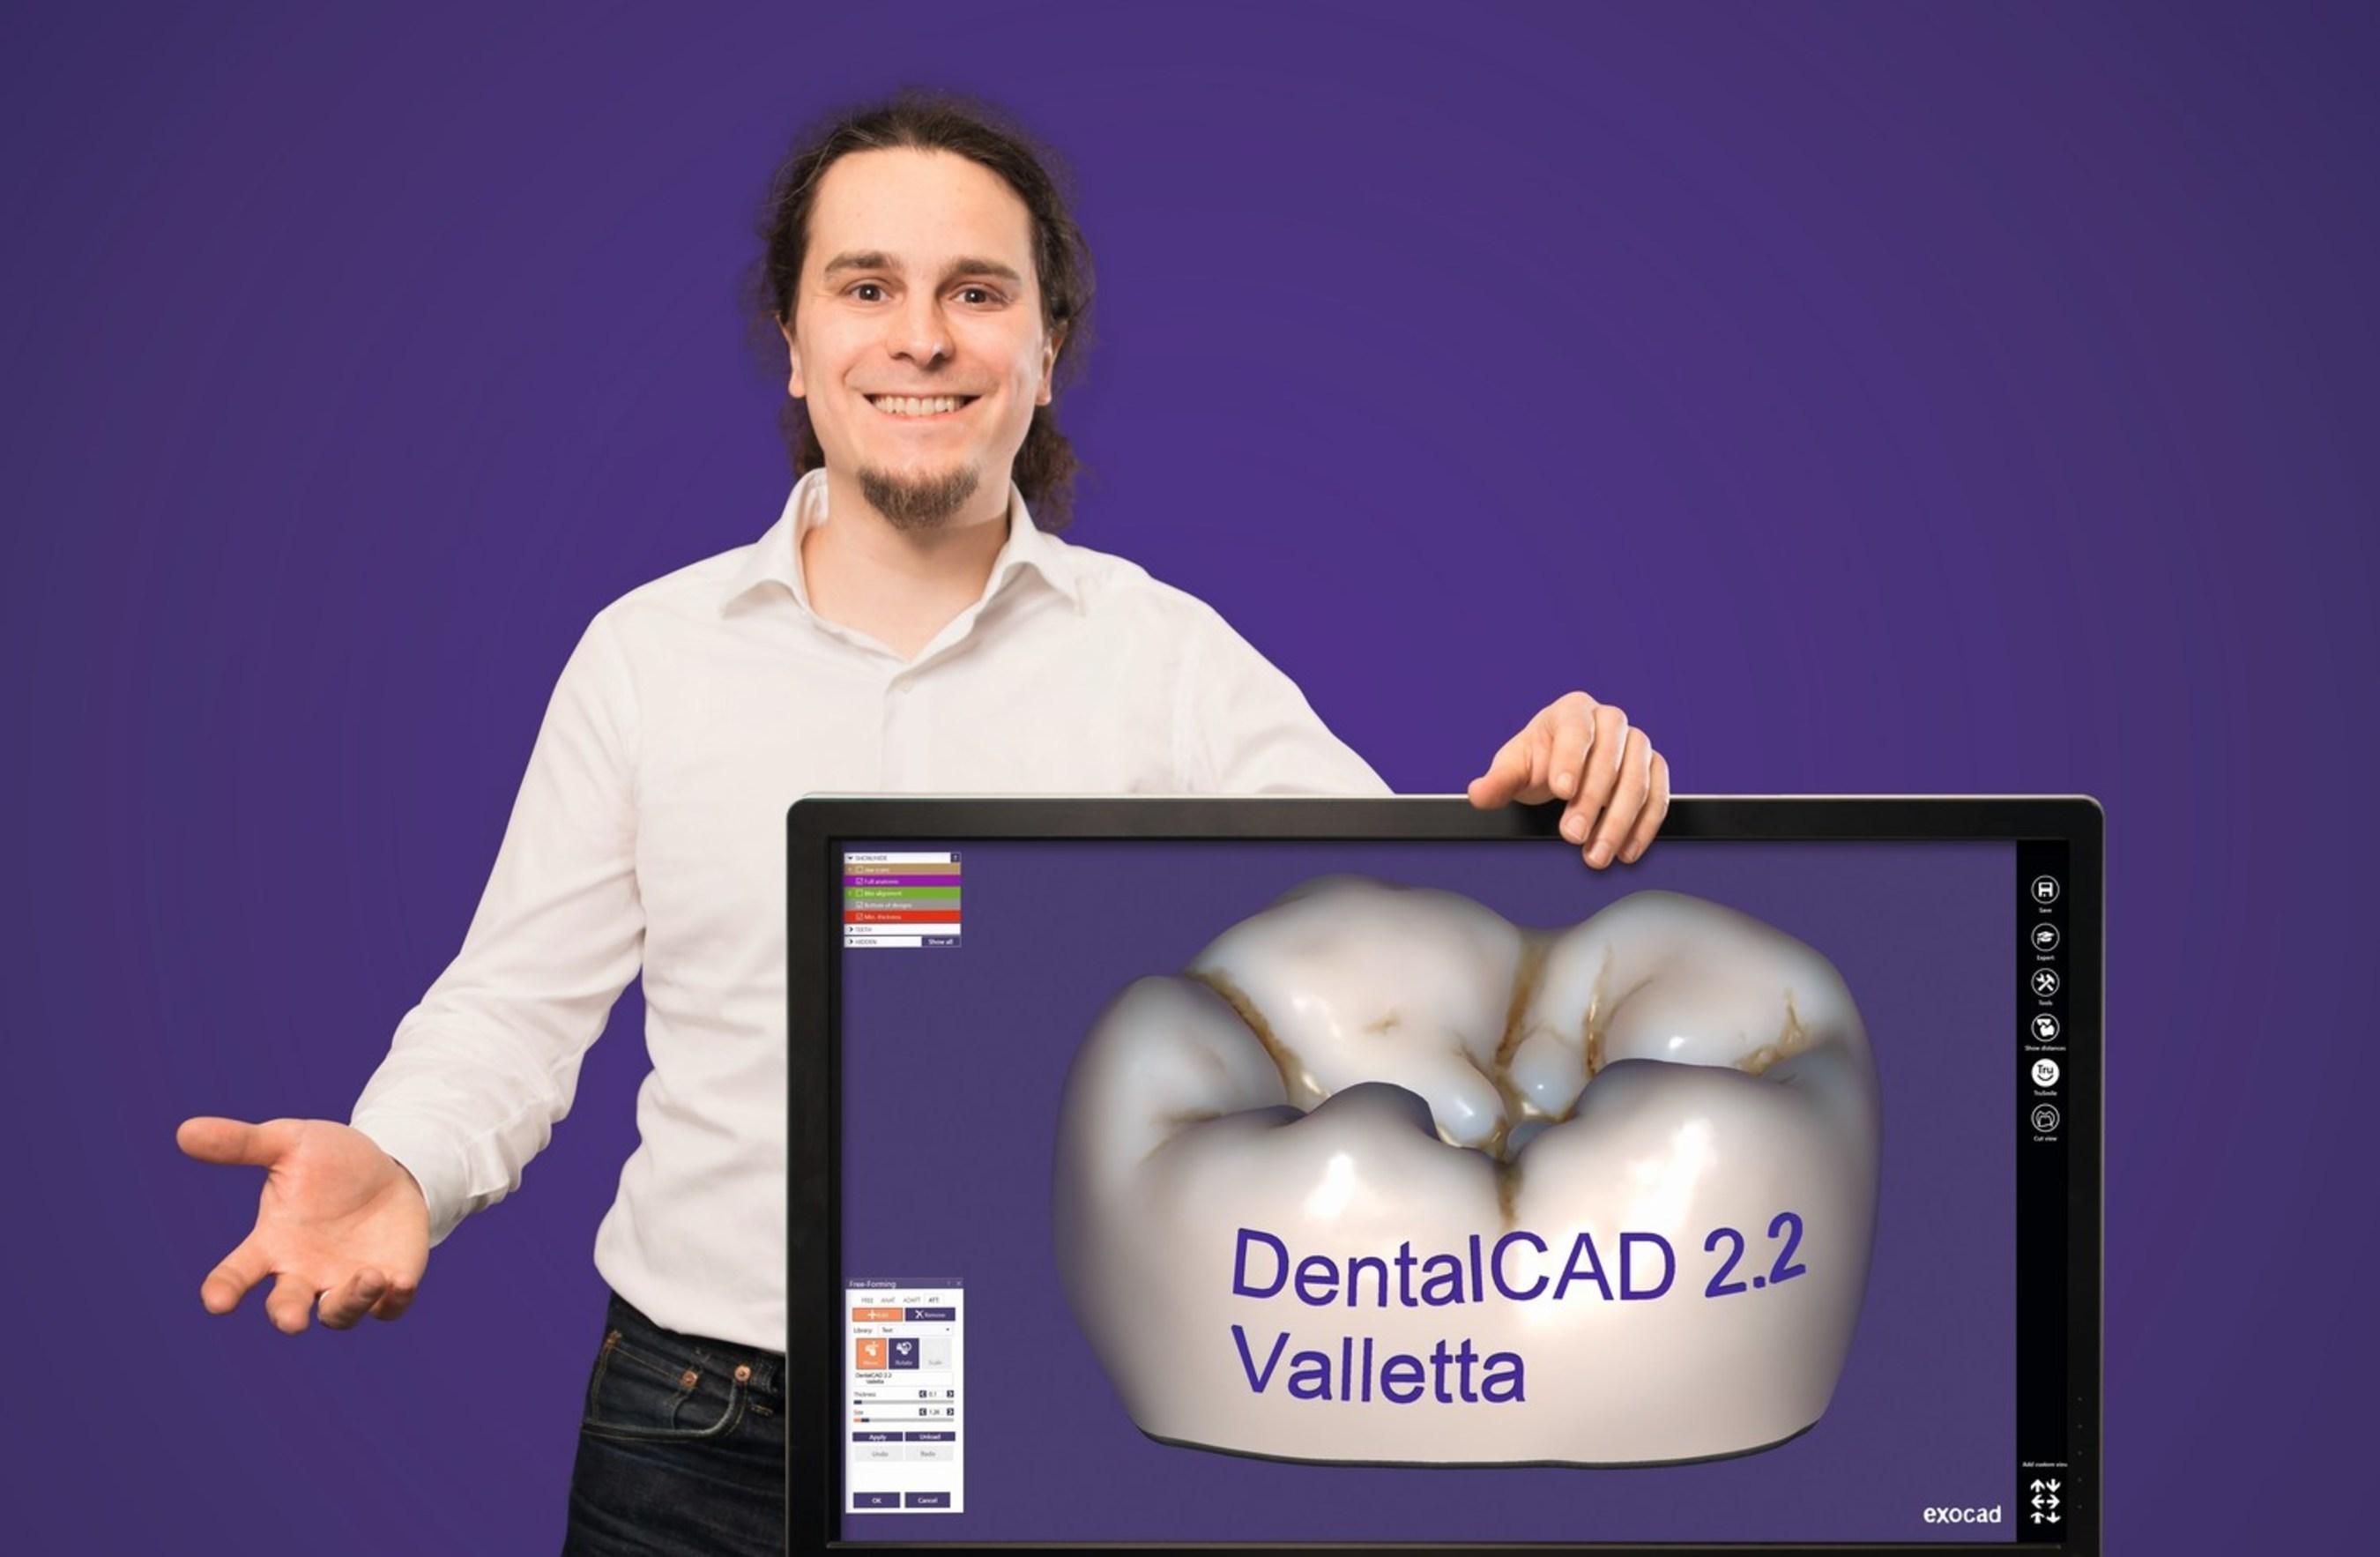 exocad releases new DentalCAD 2 2 Valletta - largest